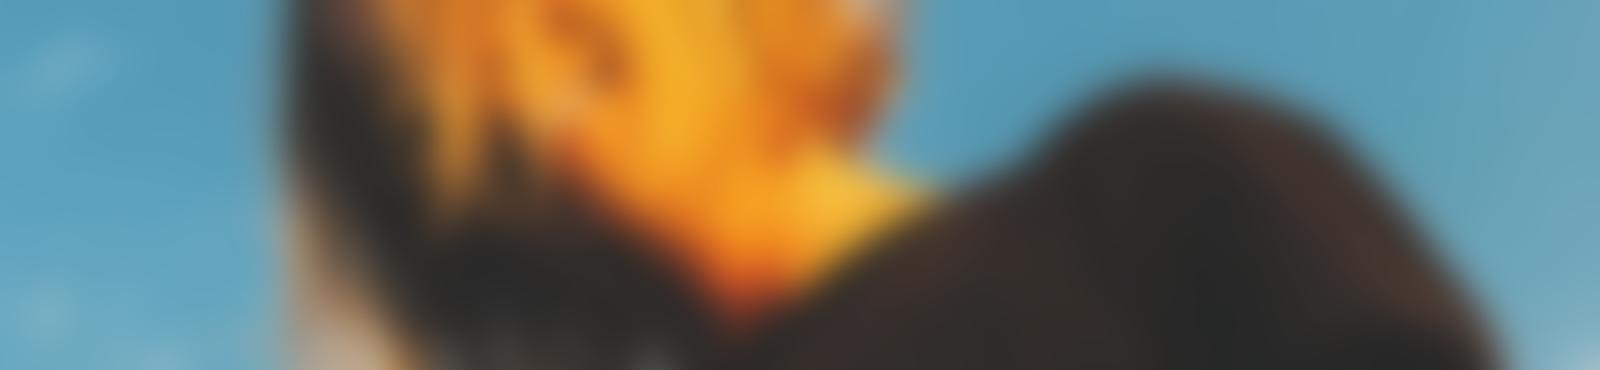 Blurred 3535a9ee 0f81 4bd6 b112 1d40fef46722